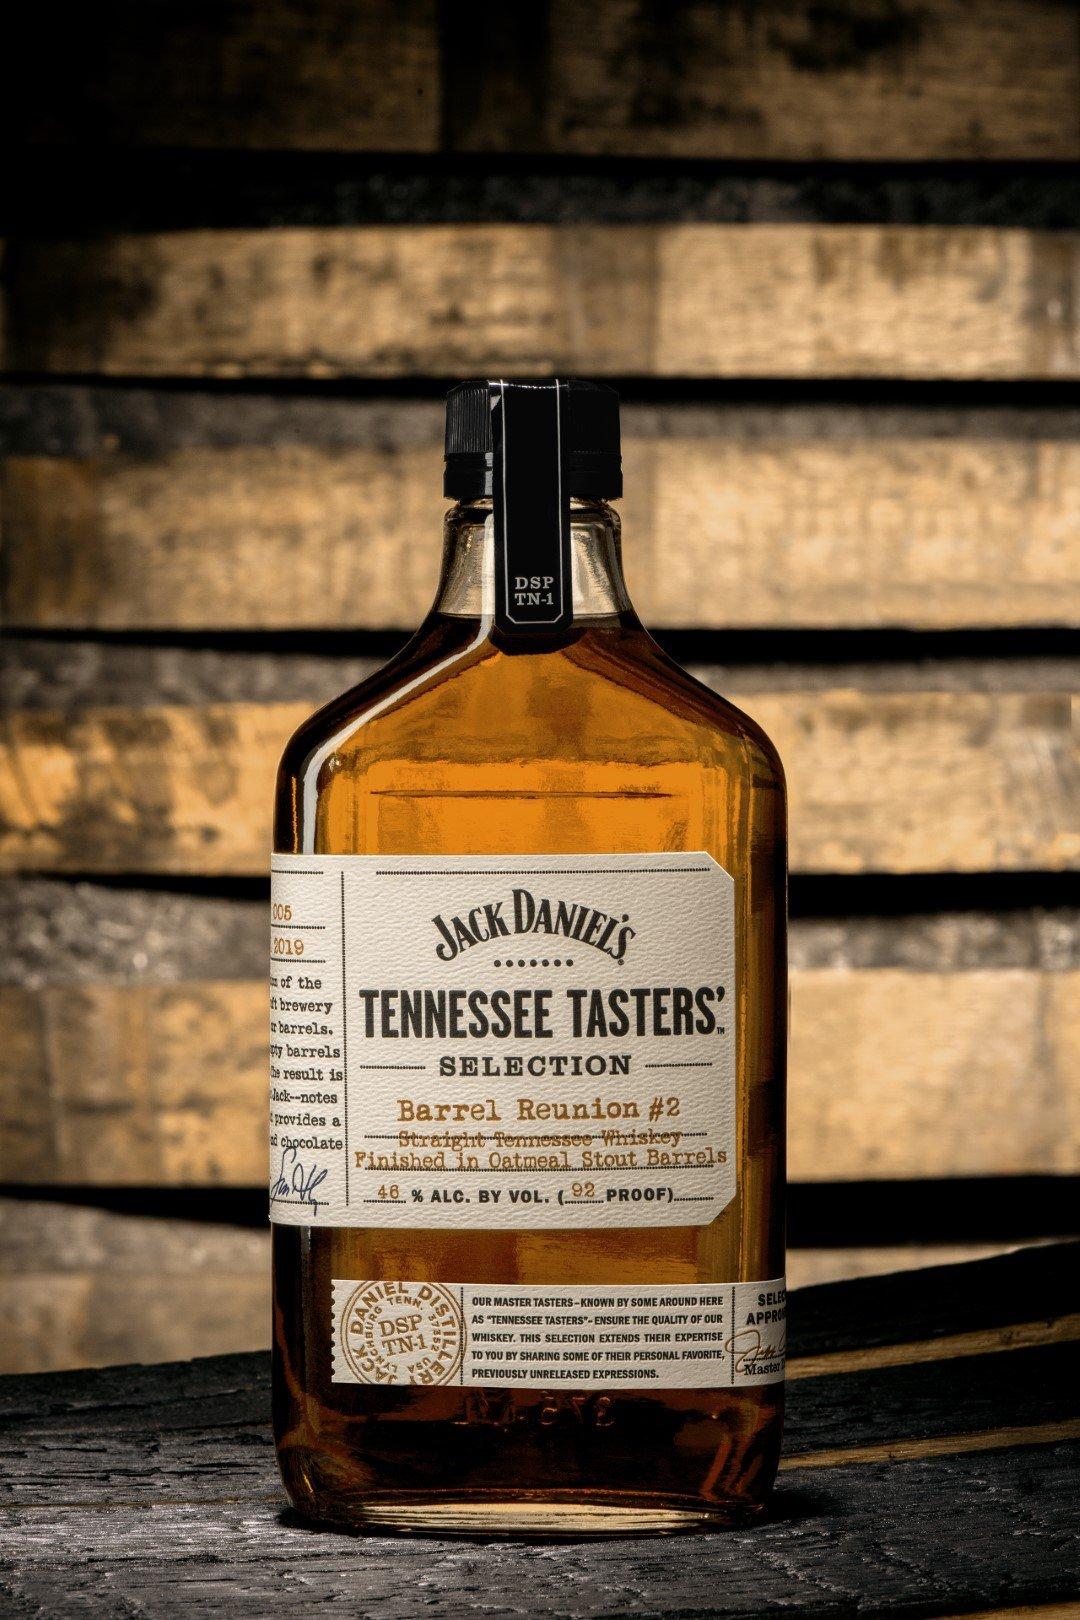 Jack Daniel's Tennessee Tasters' Selection - Barrel Reunion #2